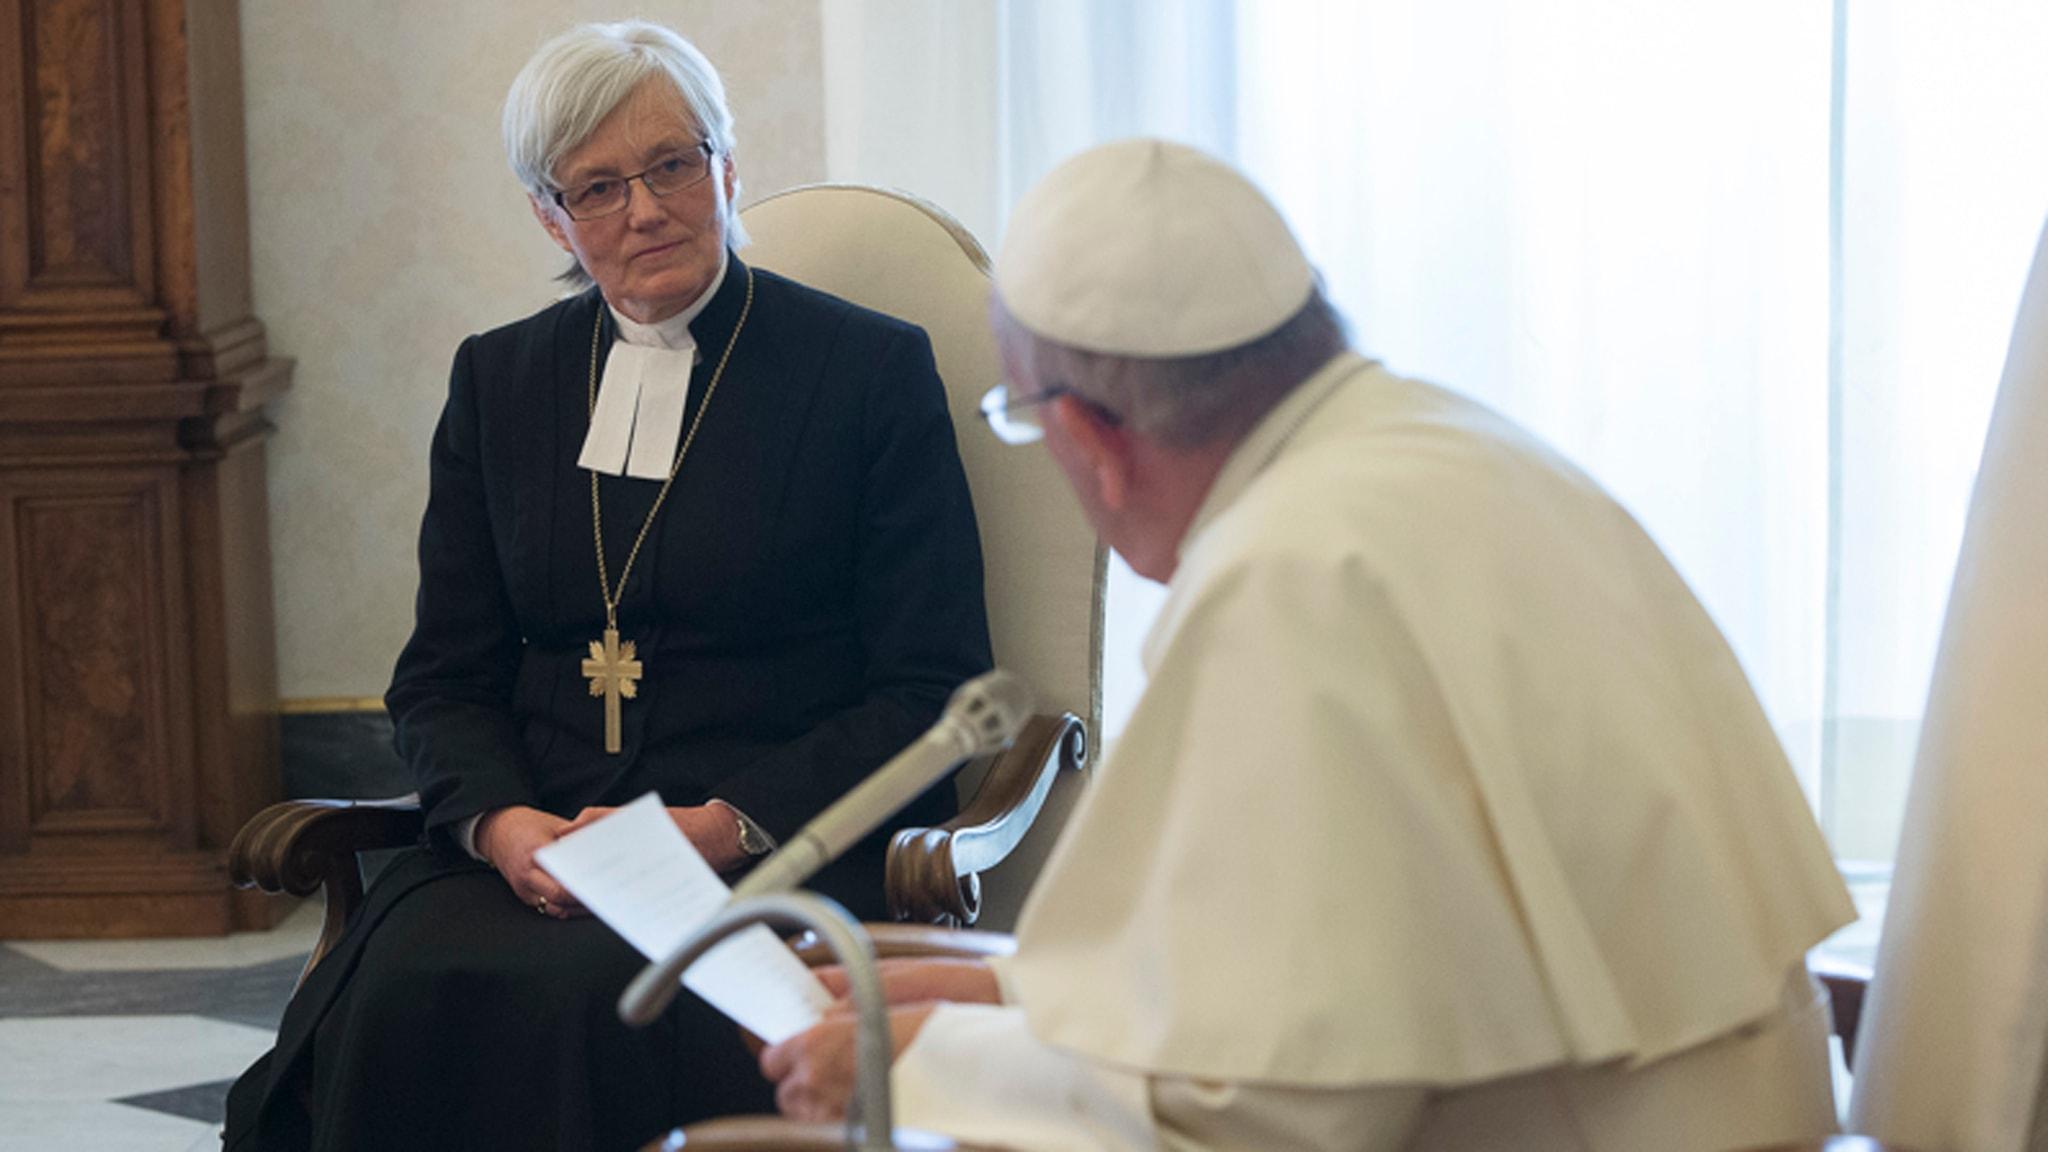 sveriges ärkebiskop